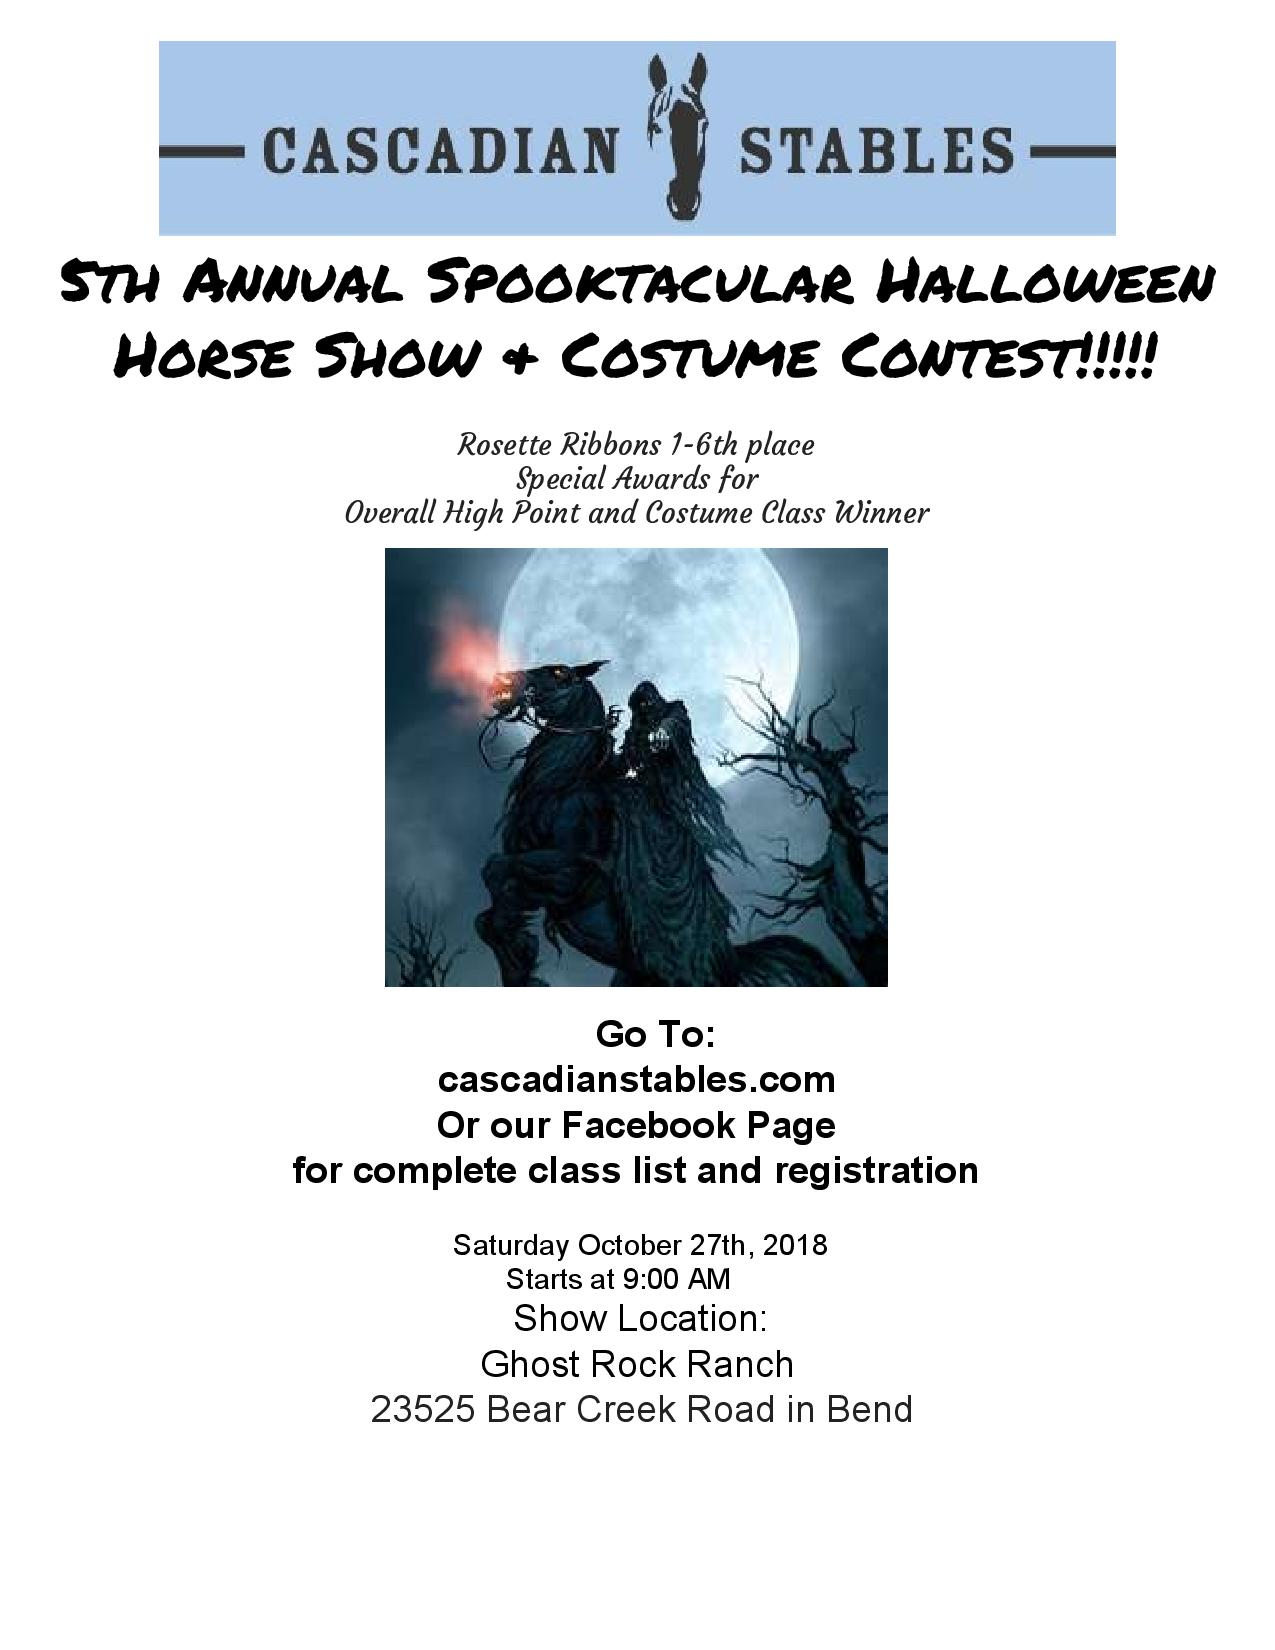 2018 spooktacular horse show flier pdf-page-001.jpg